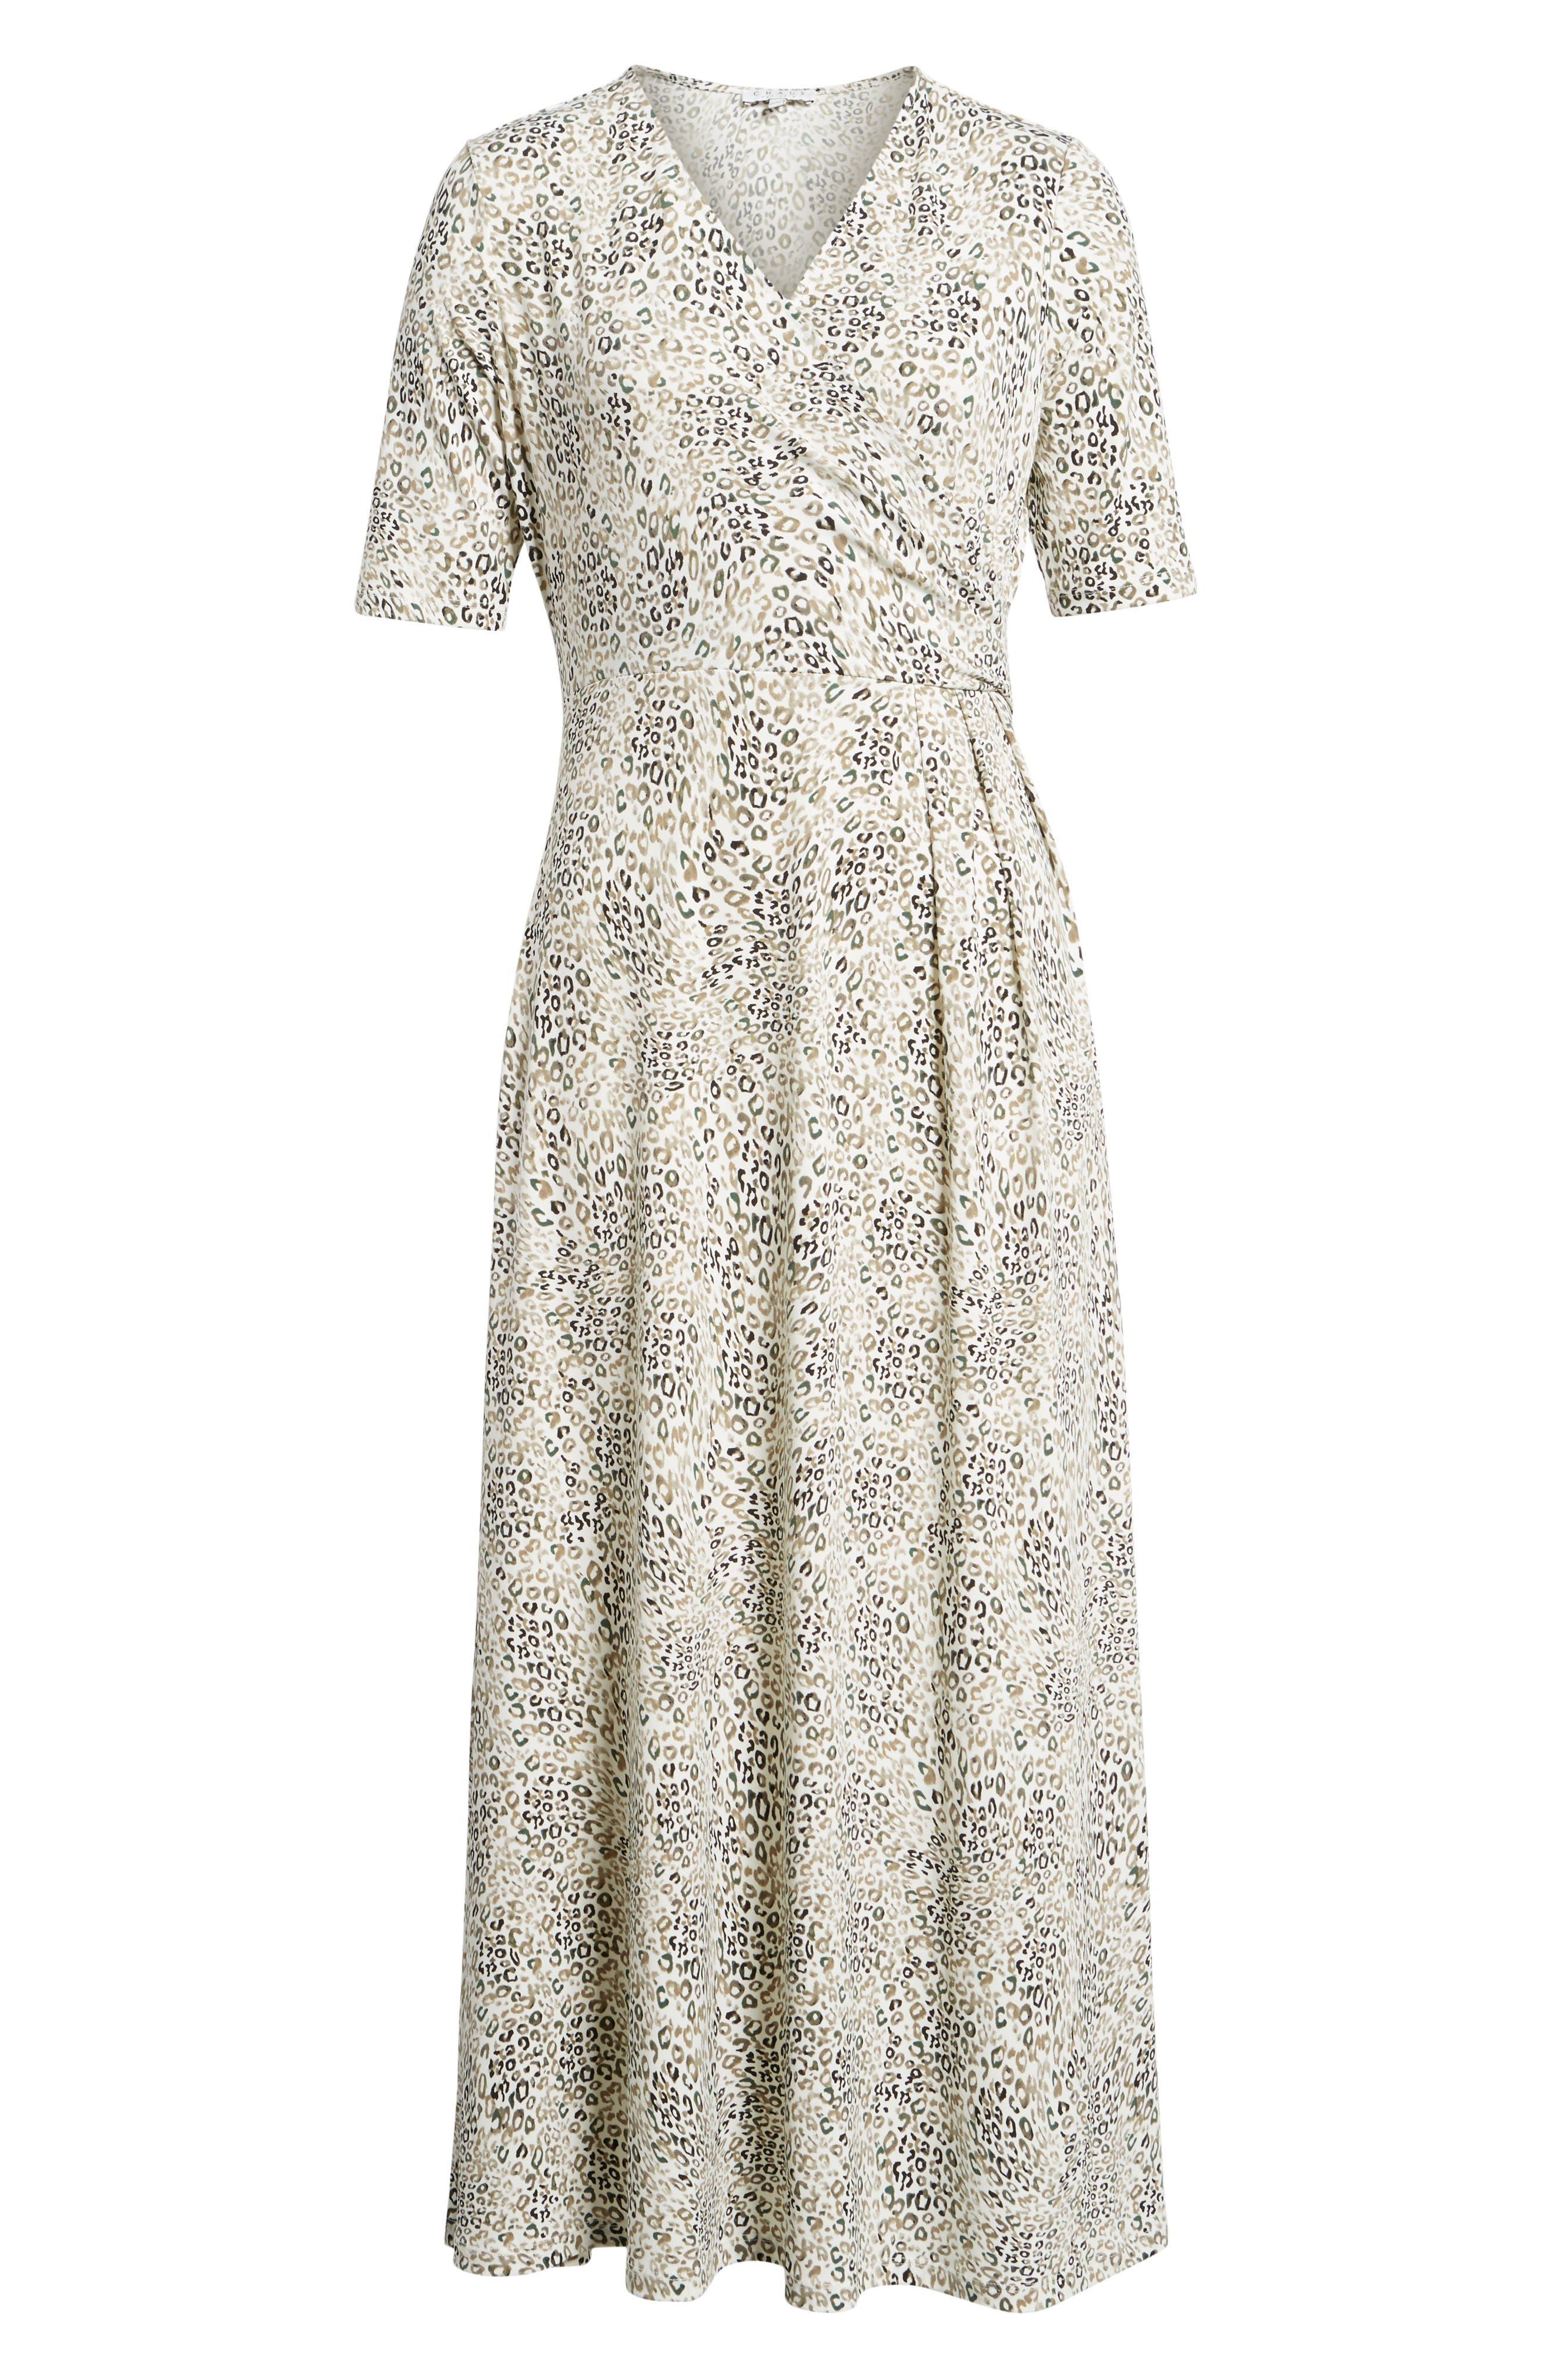 Leopard Print Maxi Dress,                             Alternate thumbnail 6, color,                             103-New Ivory